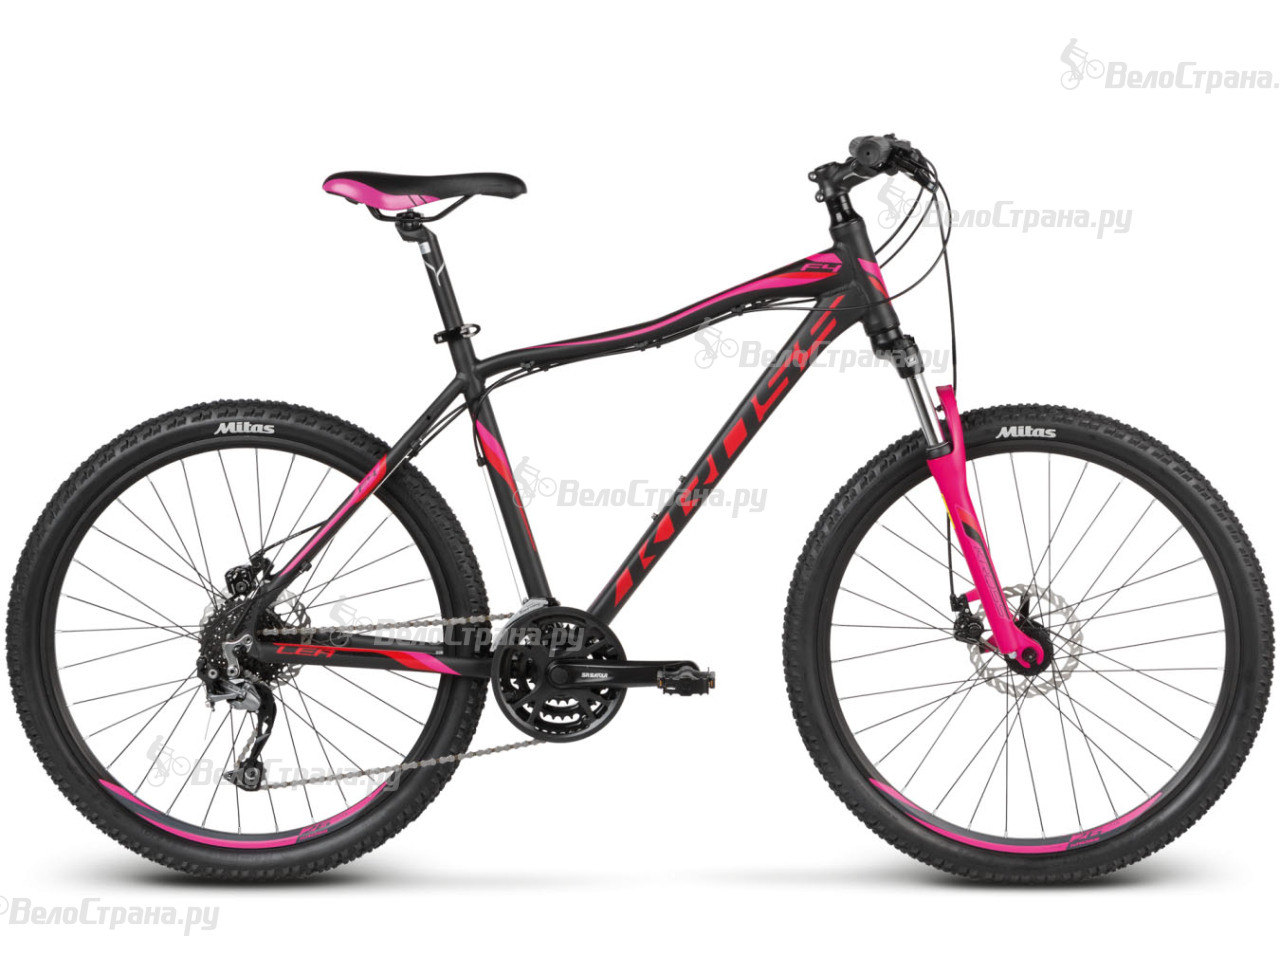 Велосипед Kross Lea F4 (2017) цены онлайн